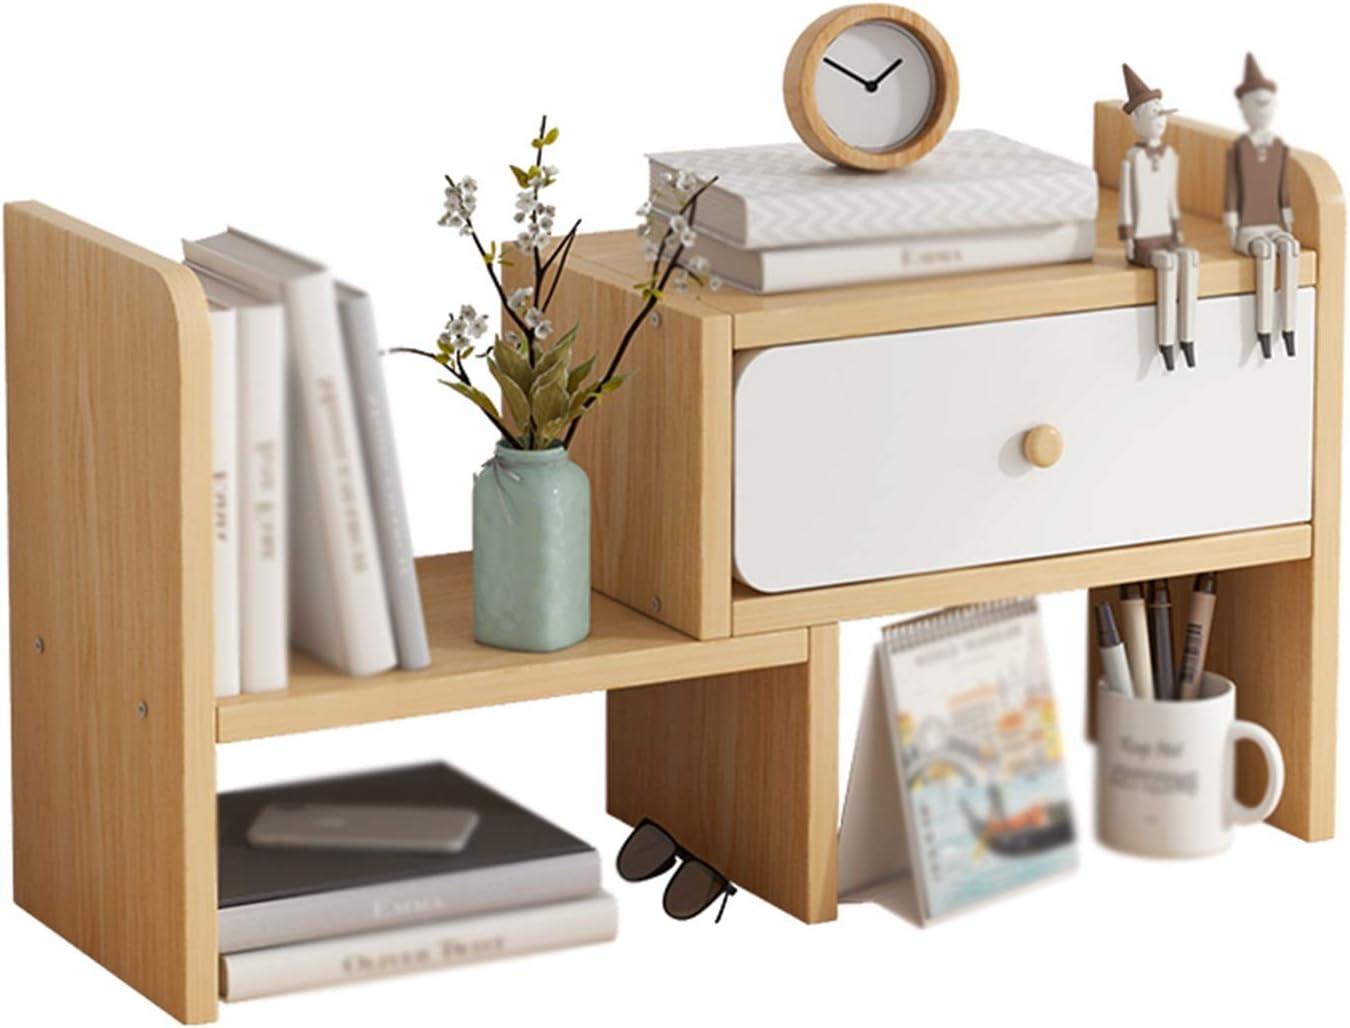 XJJUN Bookshelves Desktop Racks Storage Office Desk Max 50% Indianapolis Mall OFF Mul